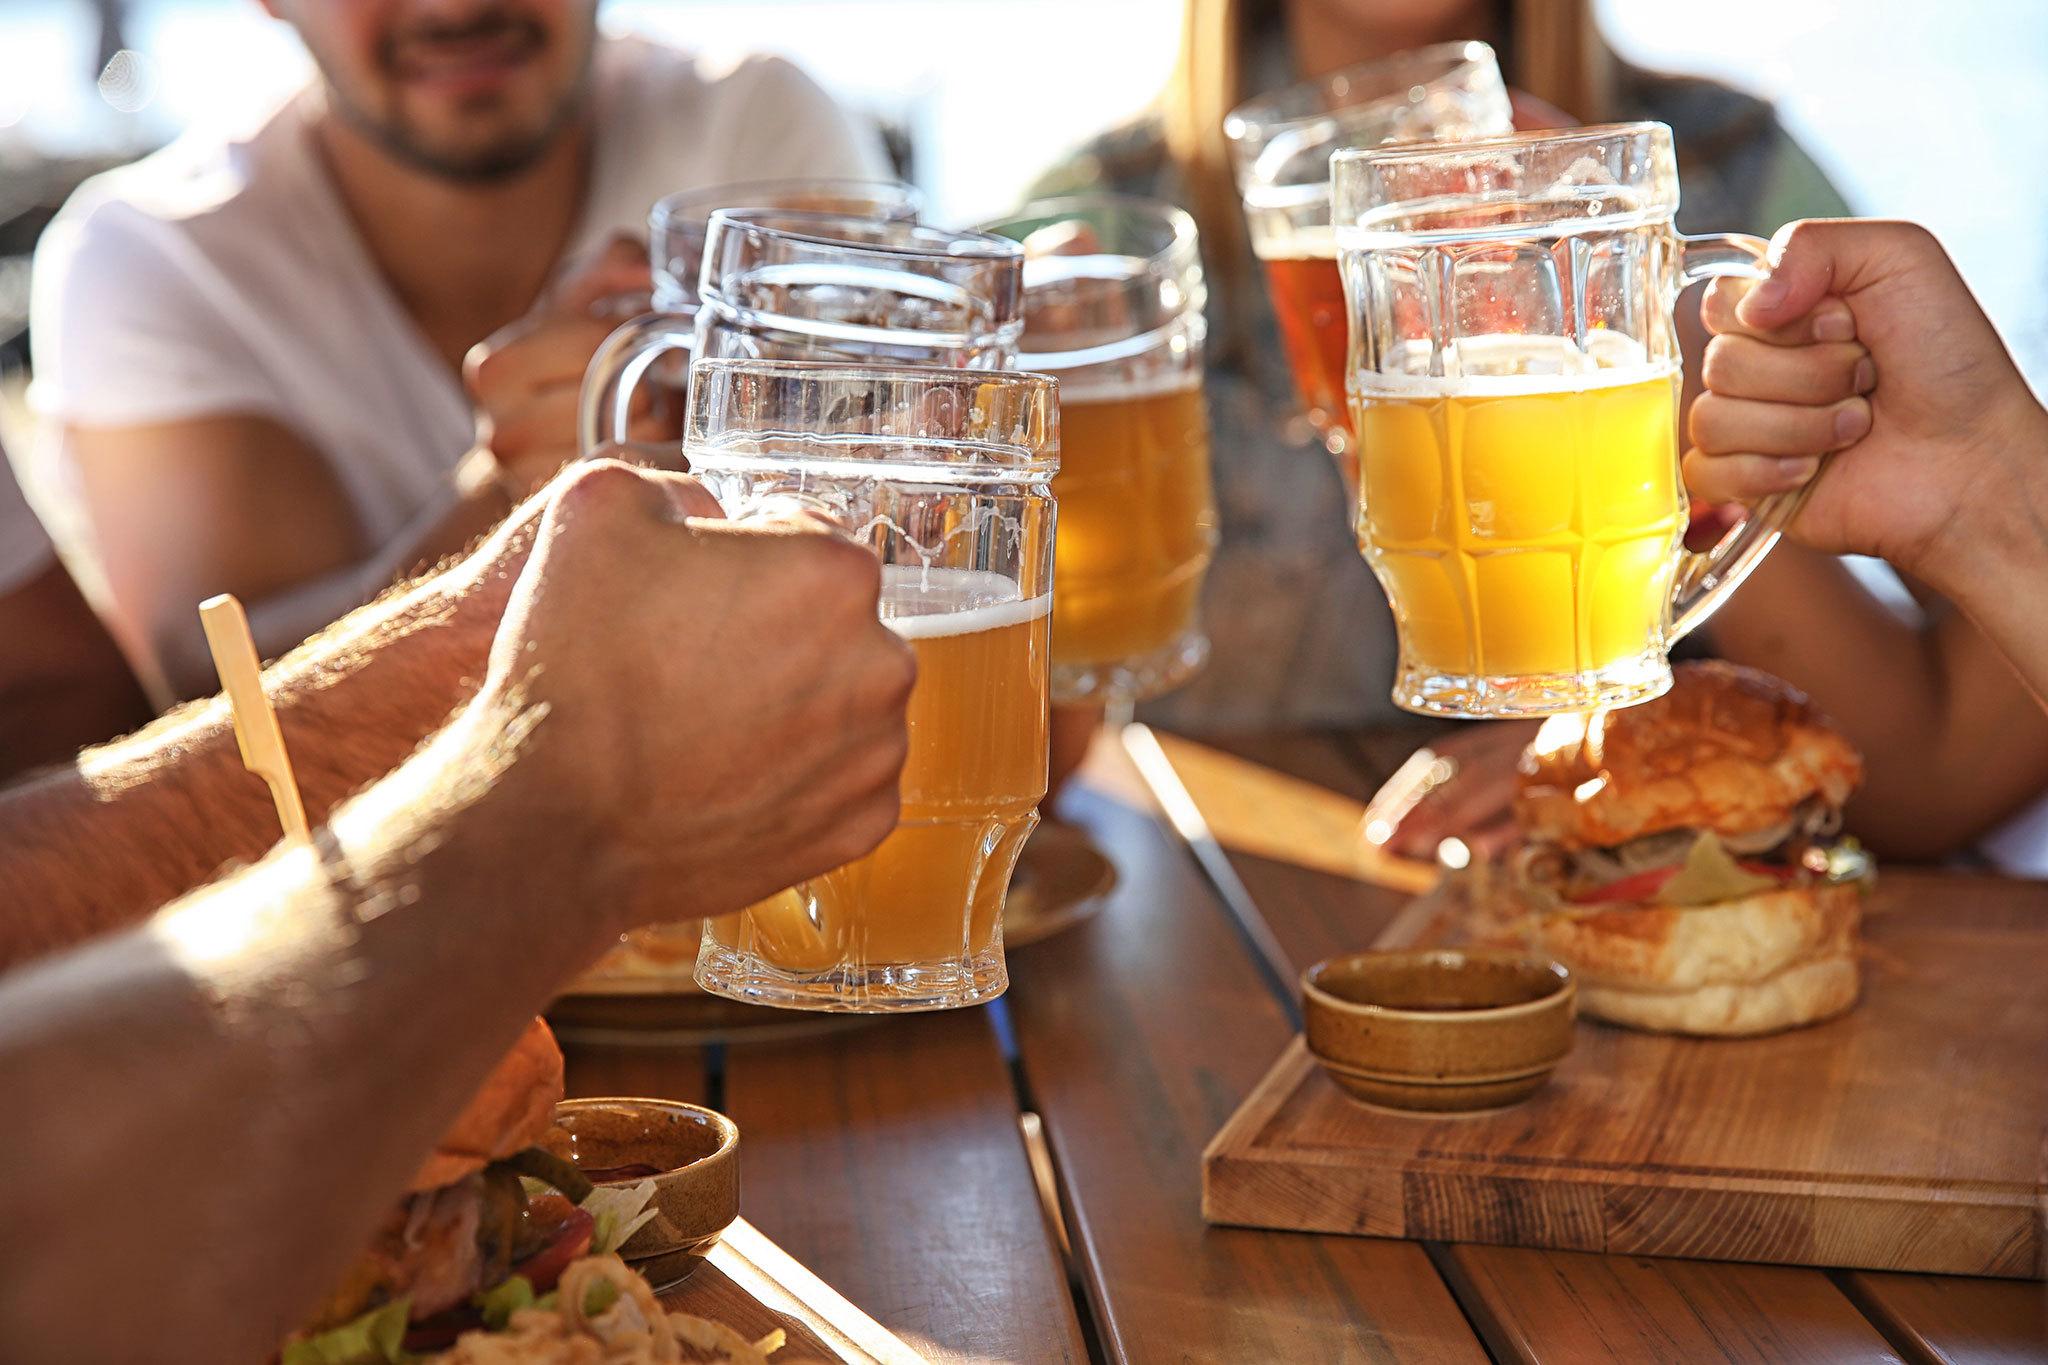 Beer Gesser: manufacturer, photo, reviews 69